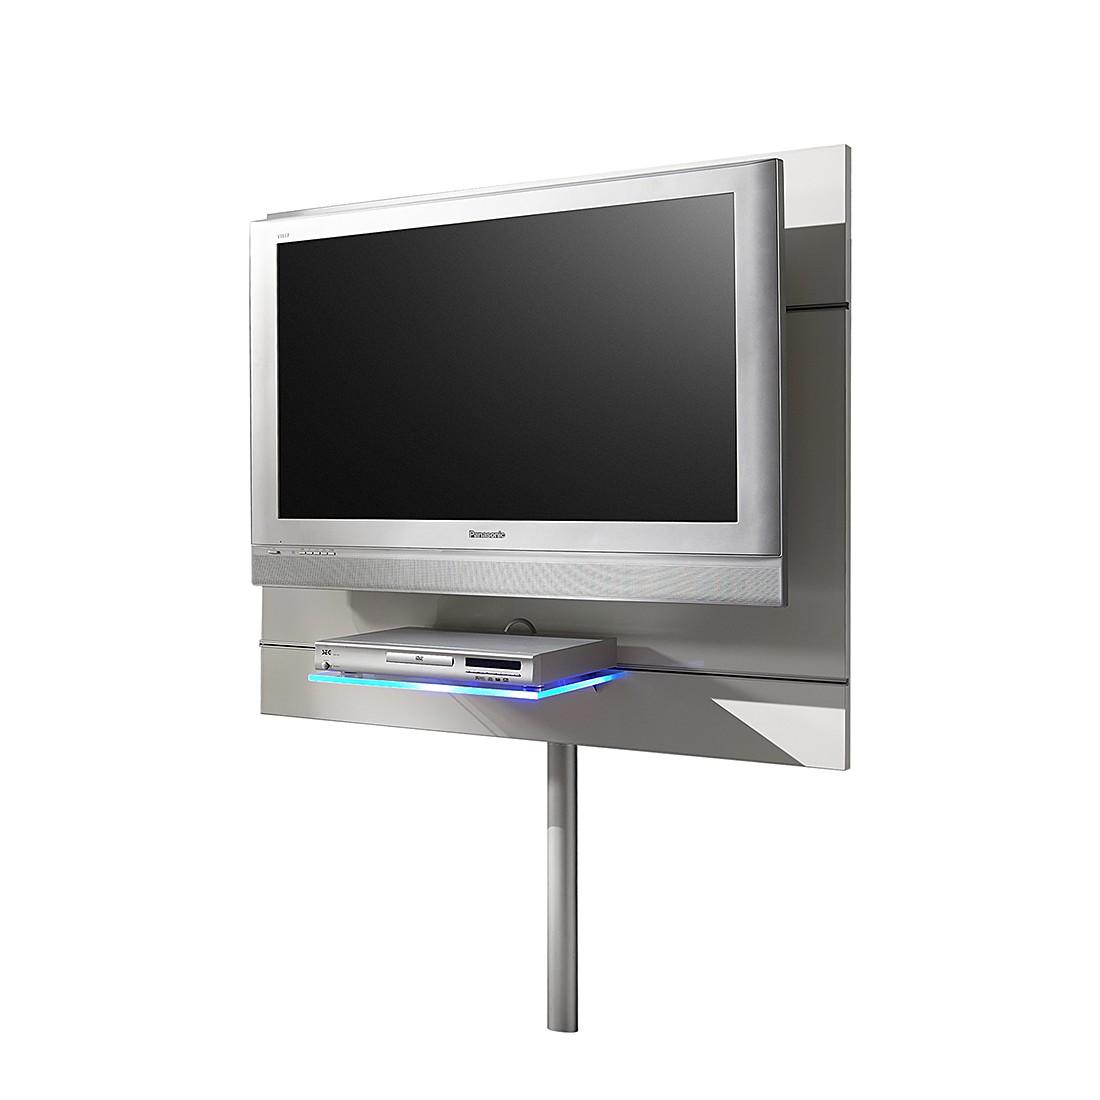 tv wandpaneel preisvergleich die besten angebote online. Black Bedroom Furniture Sets. Home Design Ideas